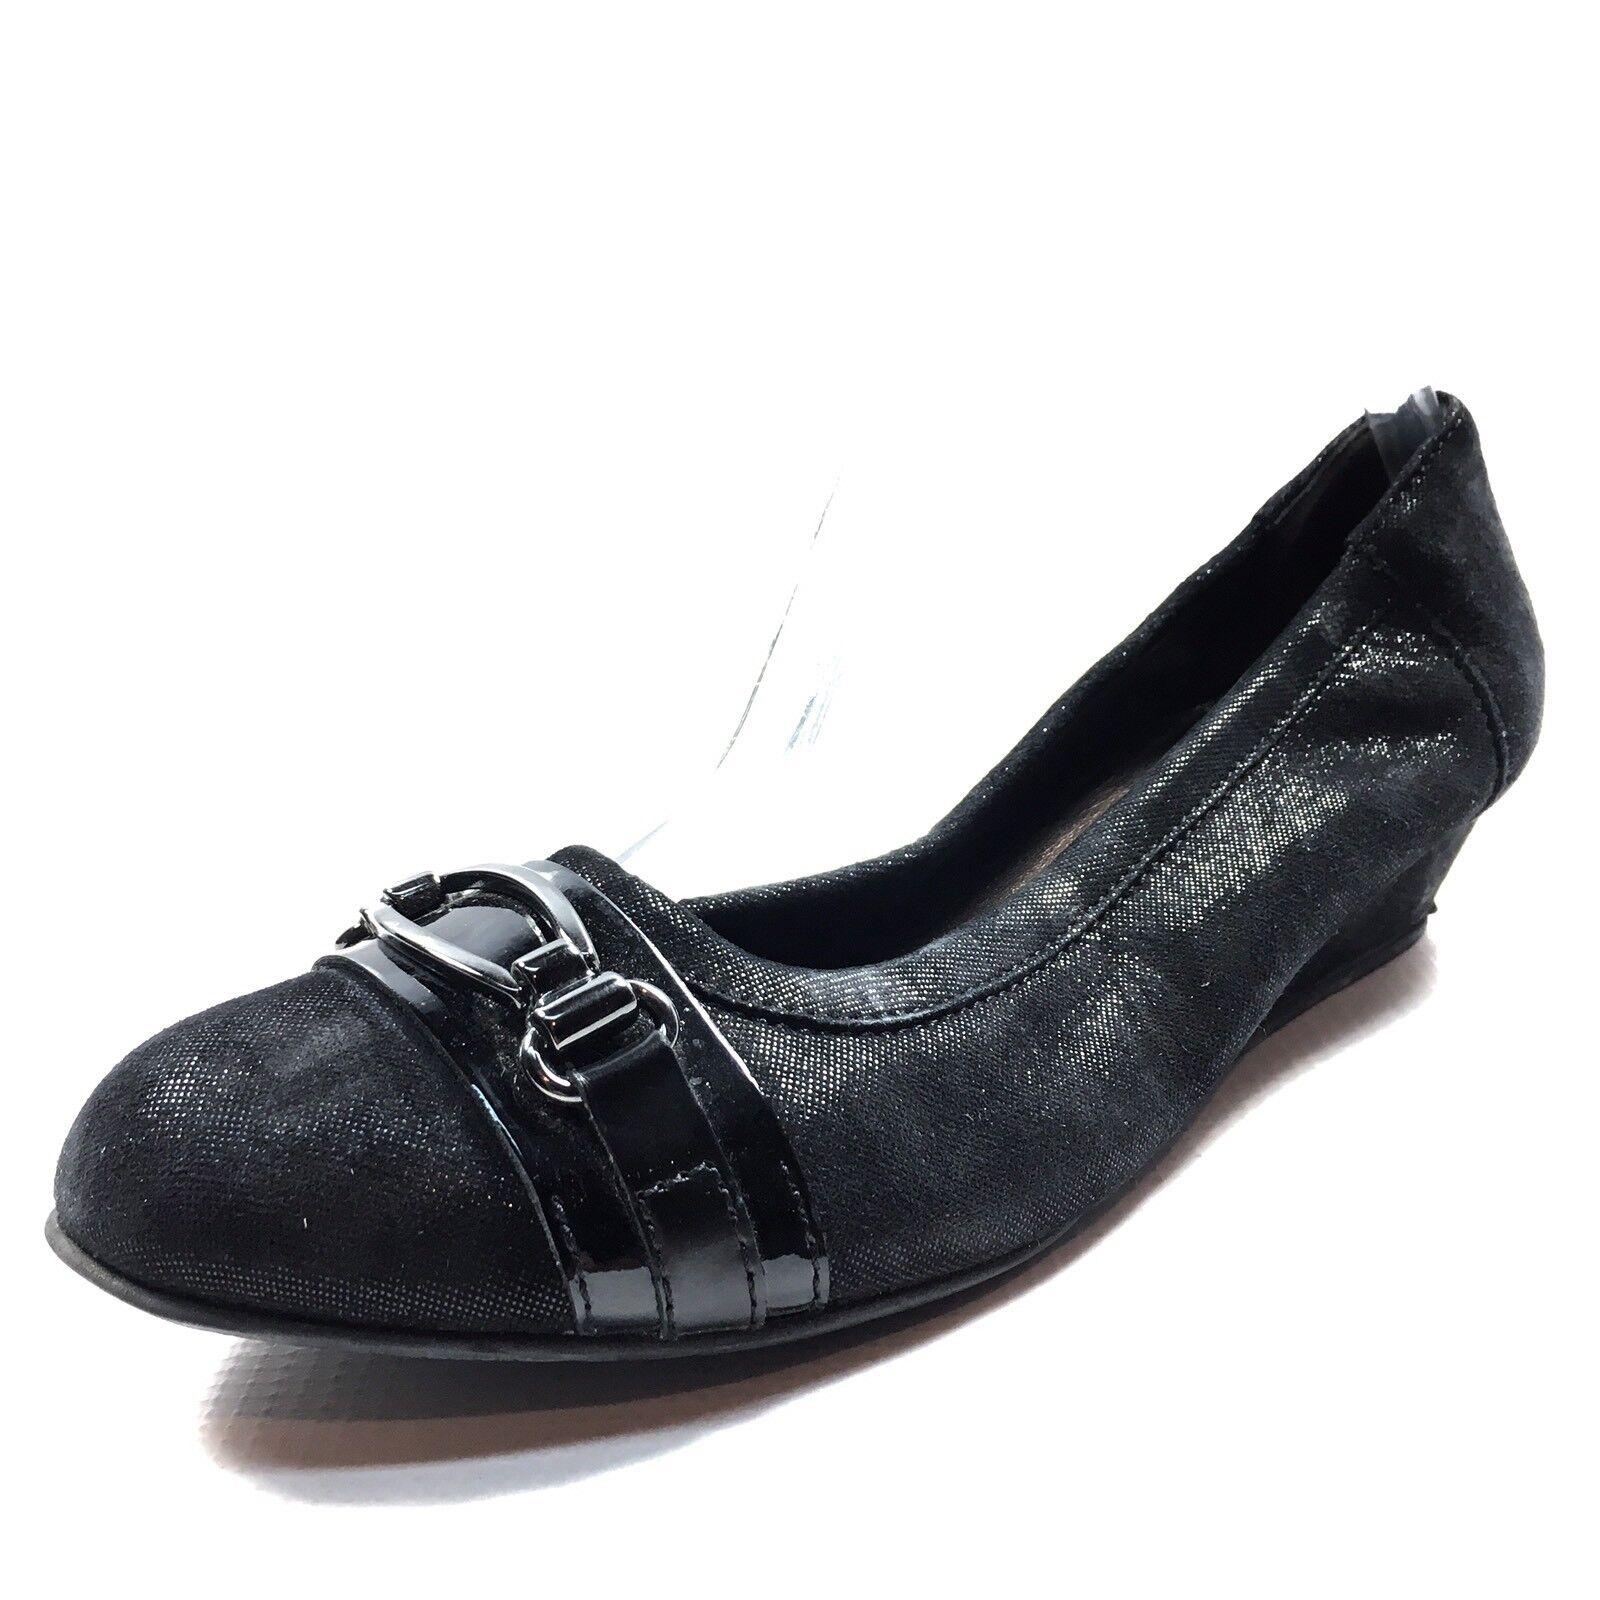 AGL Attilio Giusti Leombruni Womens Black Leather Wedge Flats Size 37.5 M